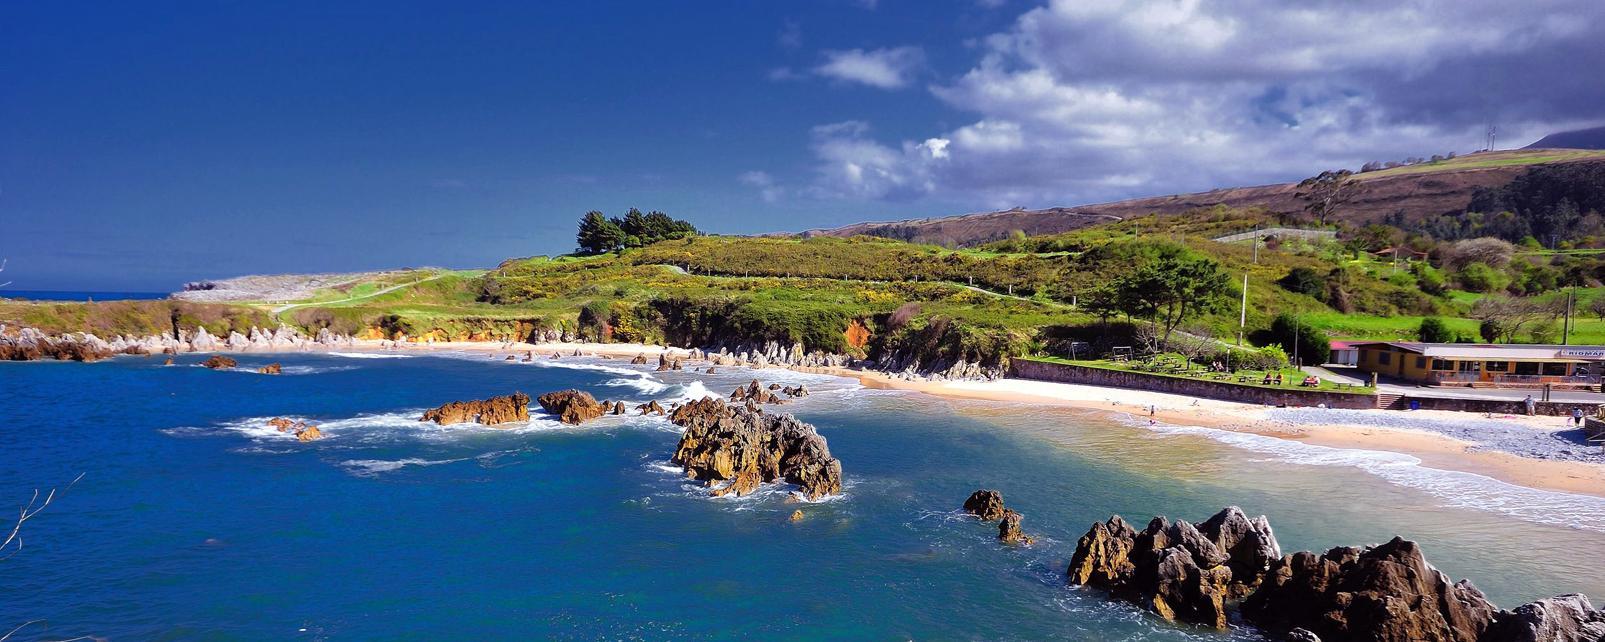 Europe, Espagne, Asturies, Llanes, plage, baignade, rocher, arbre, sable,